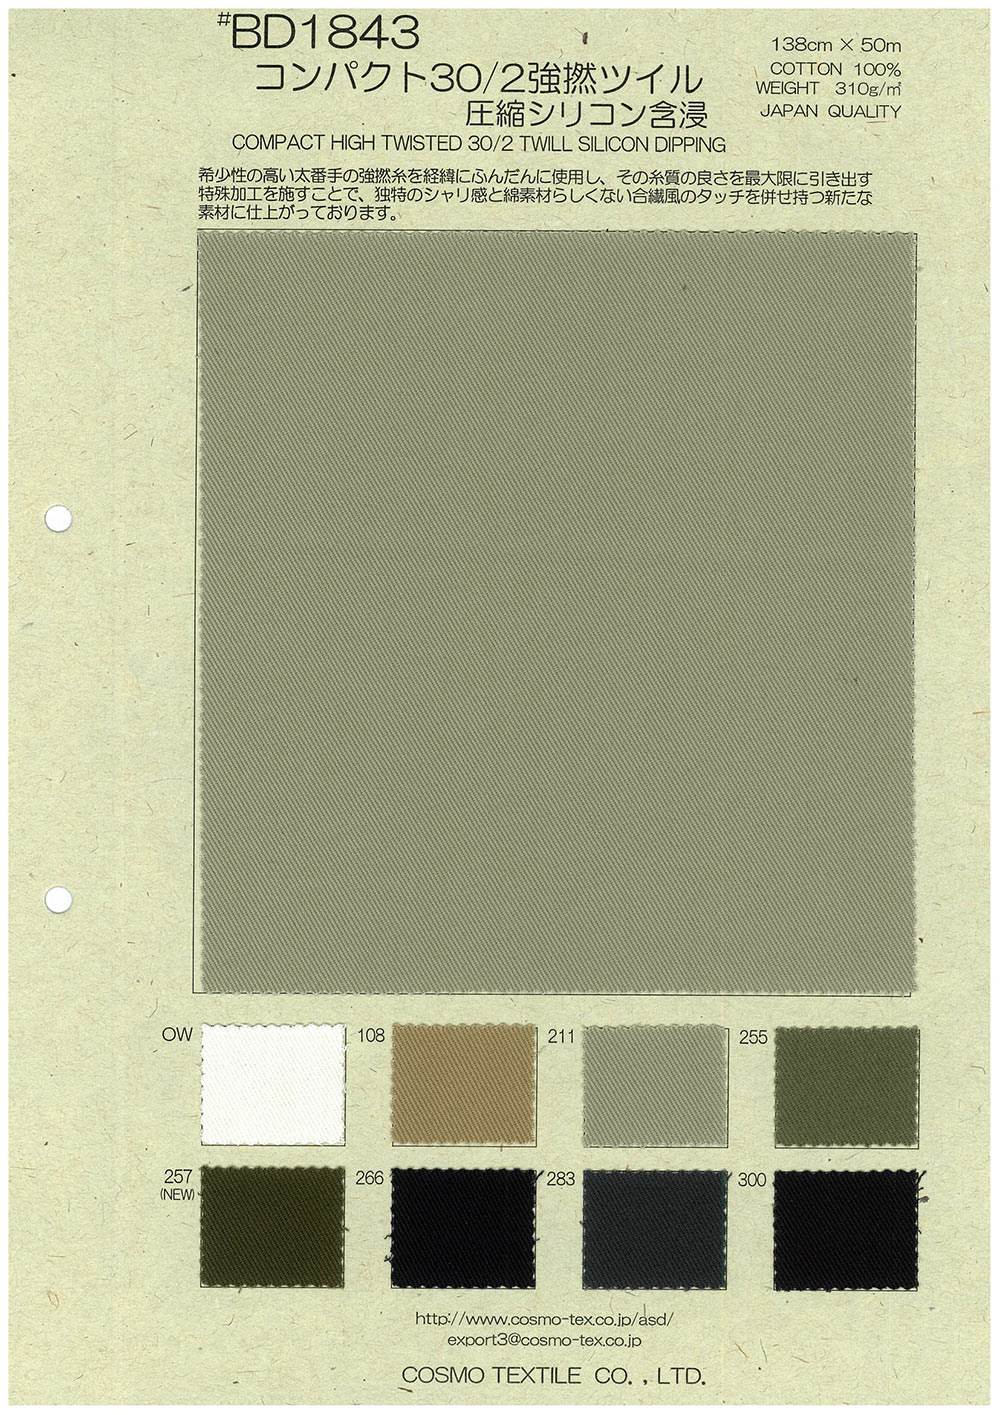 BD1843 コンパクト30/2強撚ツイル圧縮シリコン含浸[生地] コスモテキスタイル/オークラ商事 - ApparelX アパレル資材卸通販